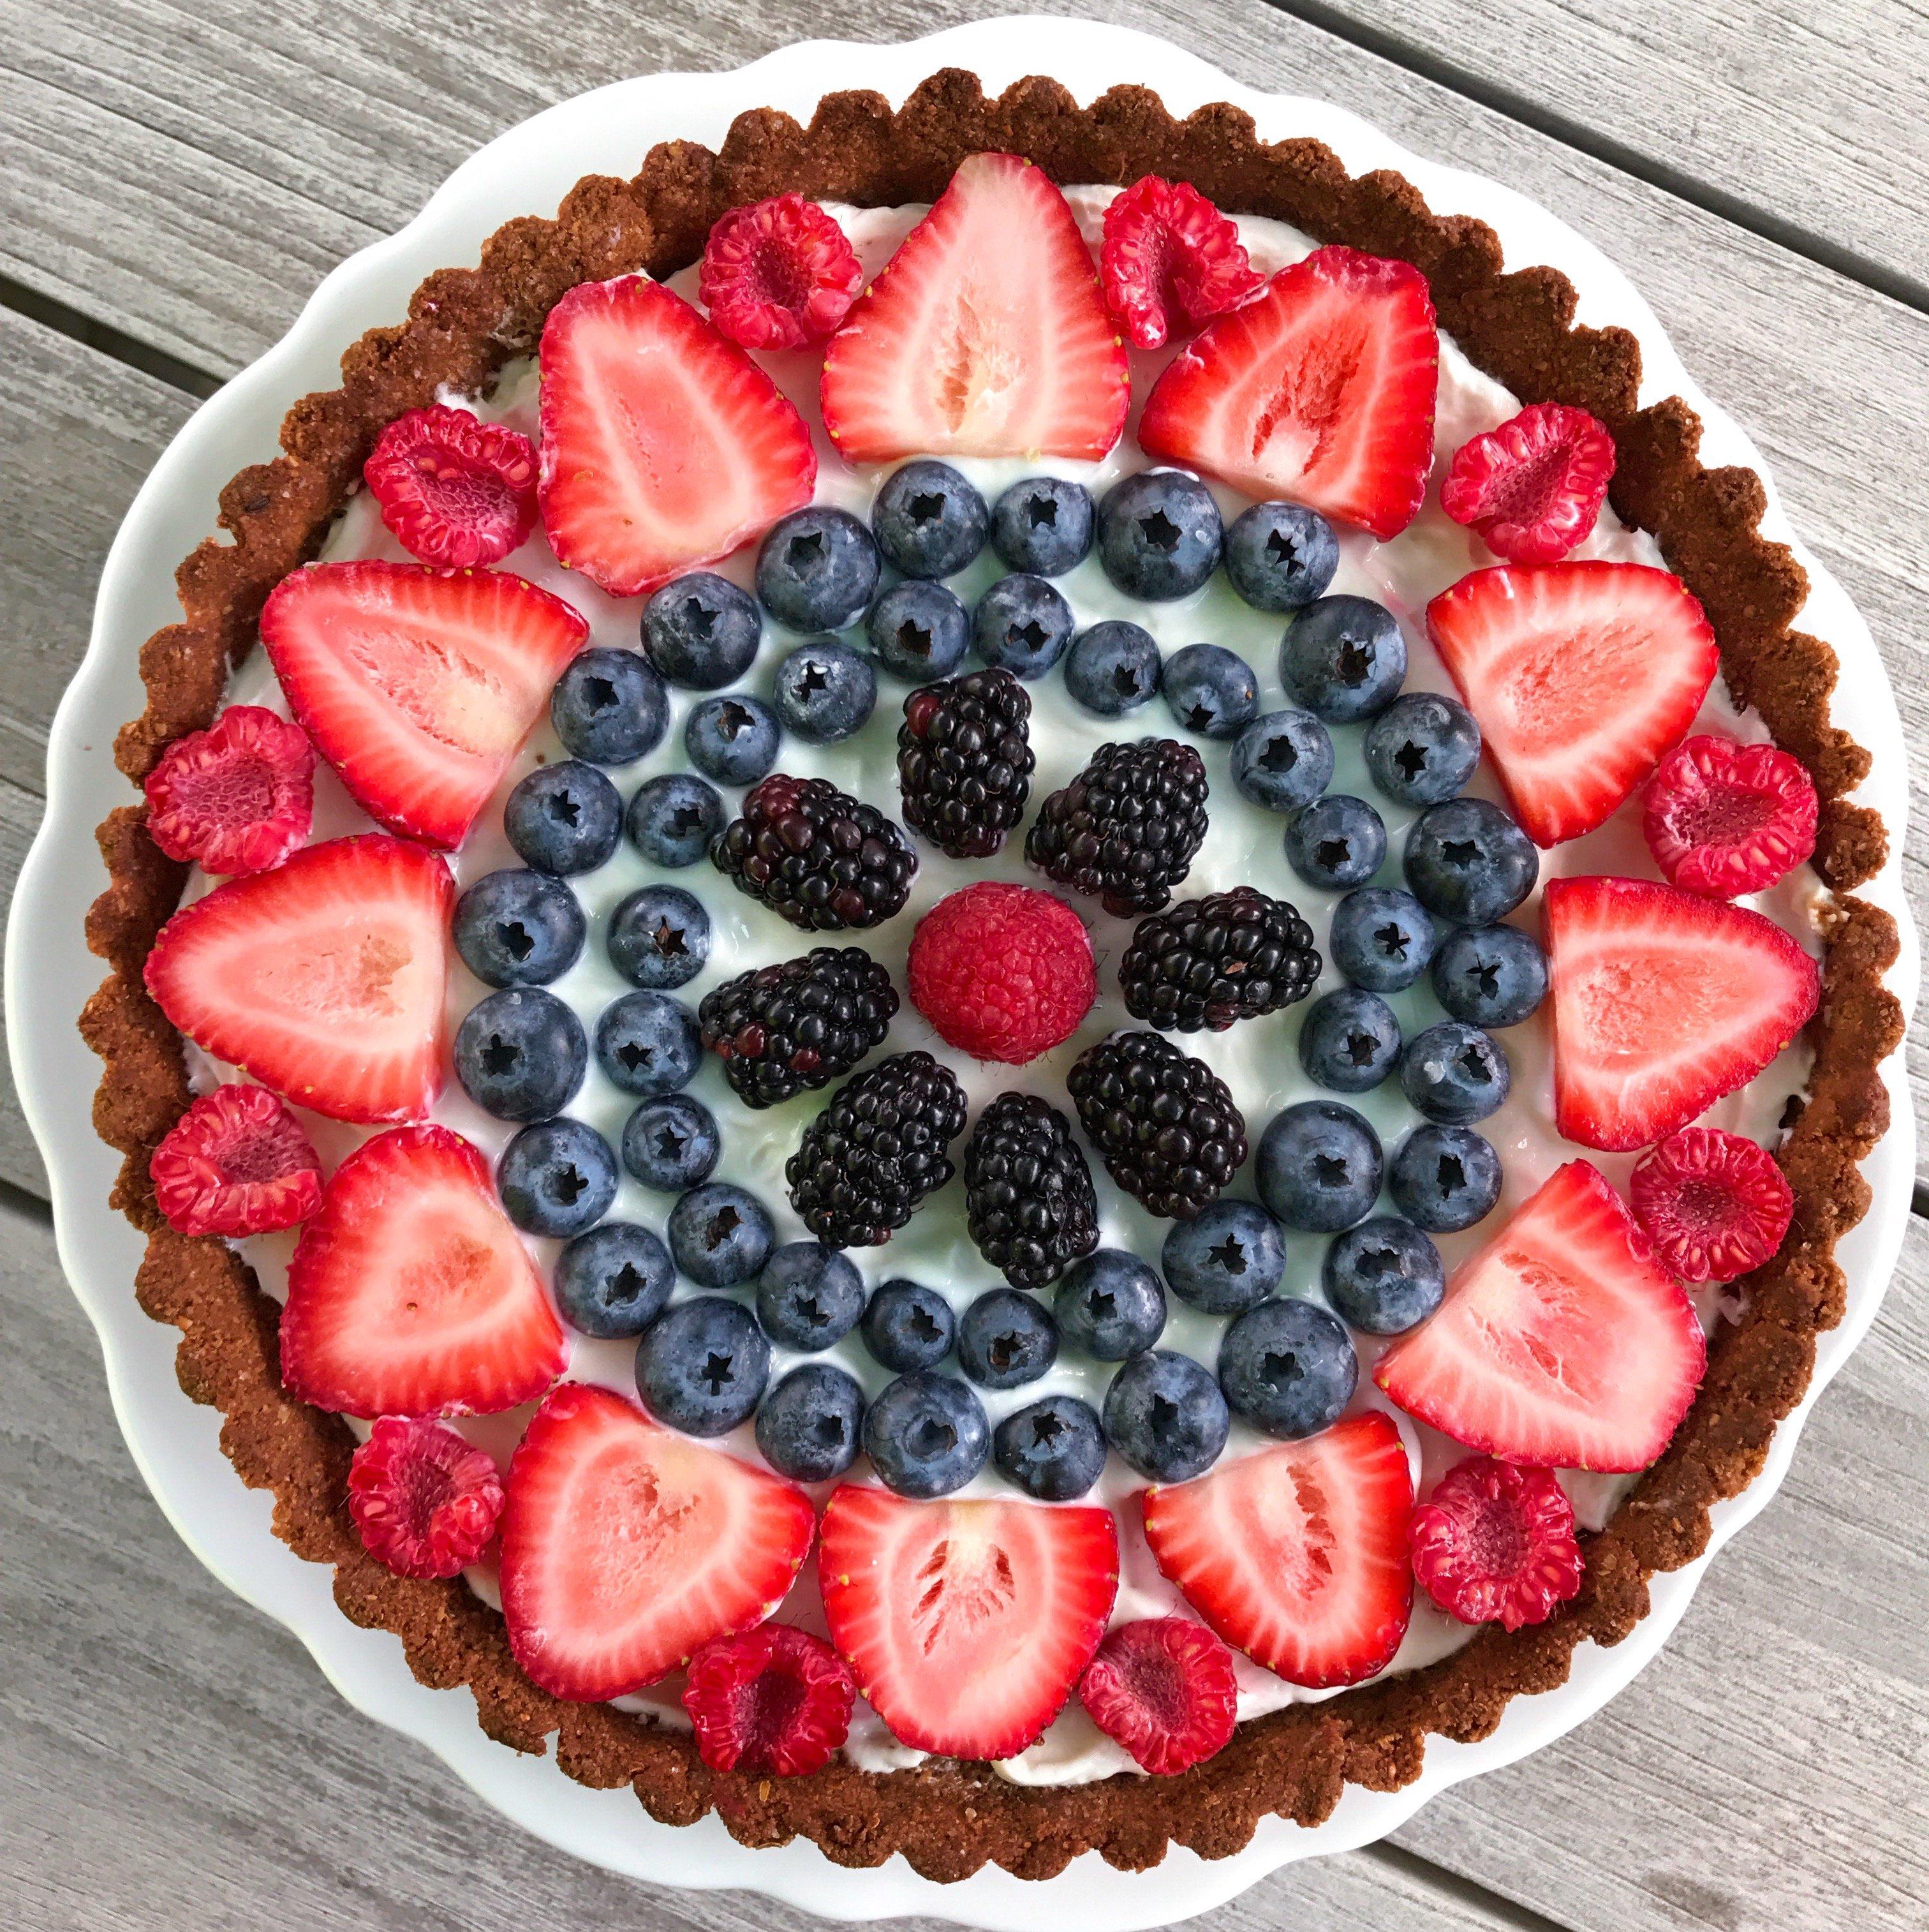 Summery Berry Tart gluten-free #glutenfreeerecipes www.healthygffamily.com